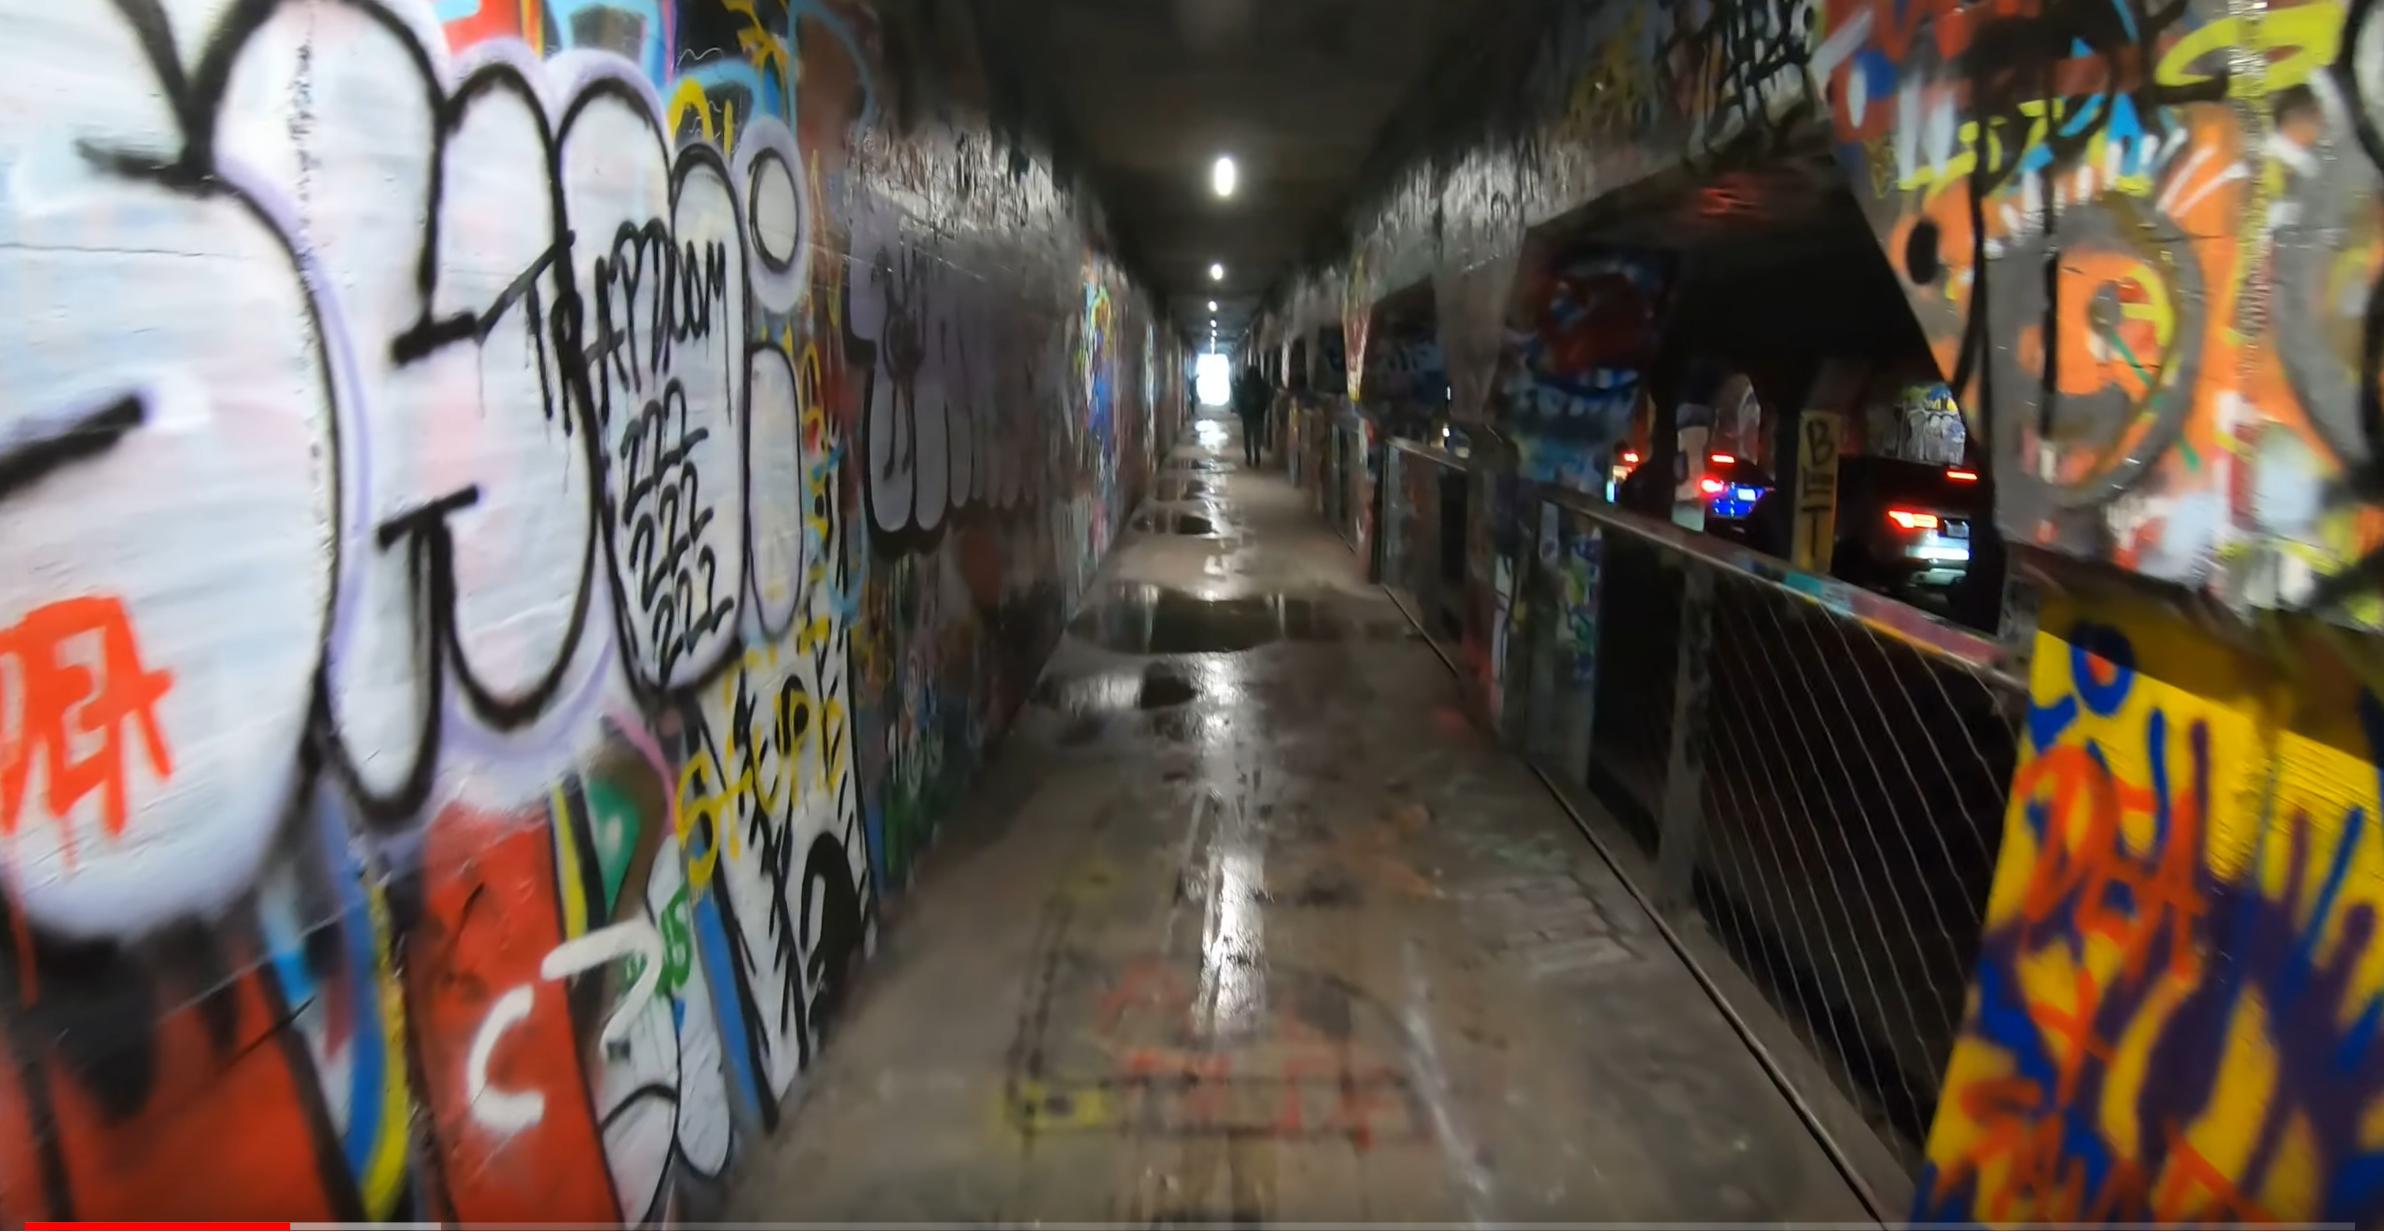 Krog Street Tunnel in Atlanta, Georgia- Graffiti Alley